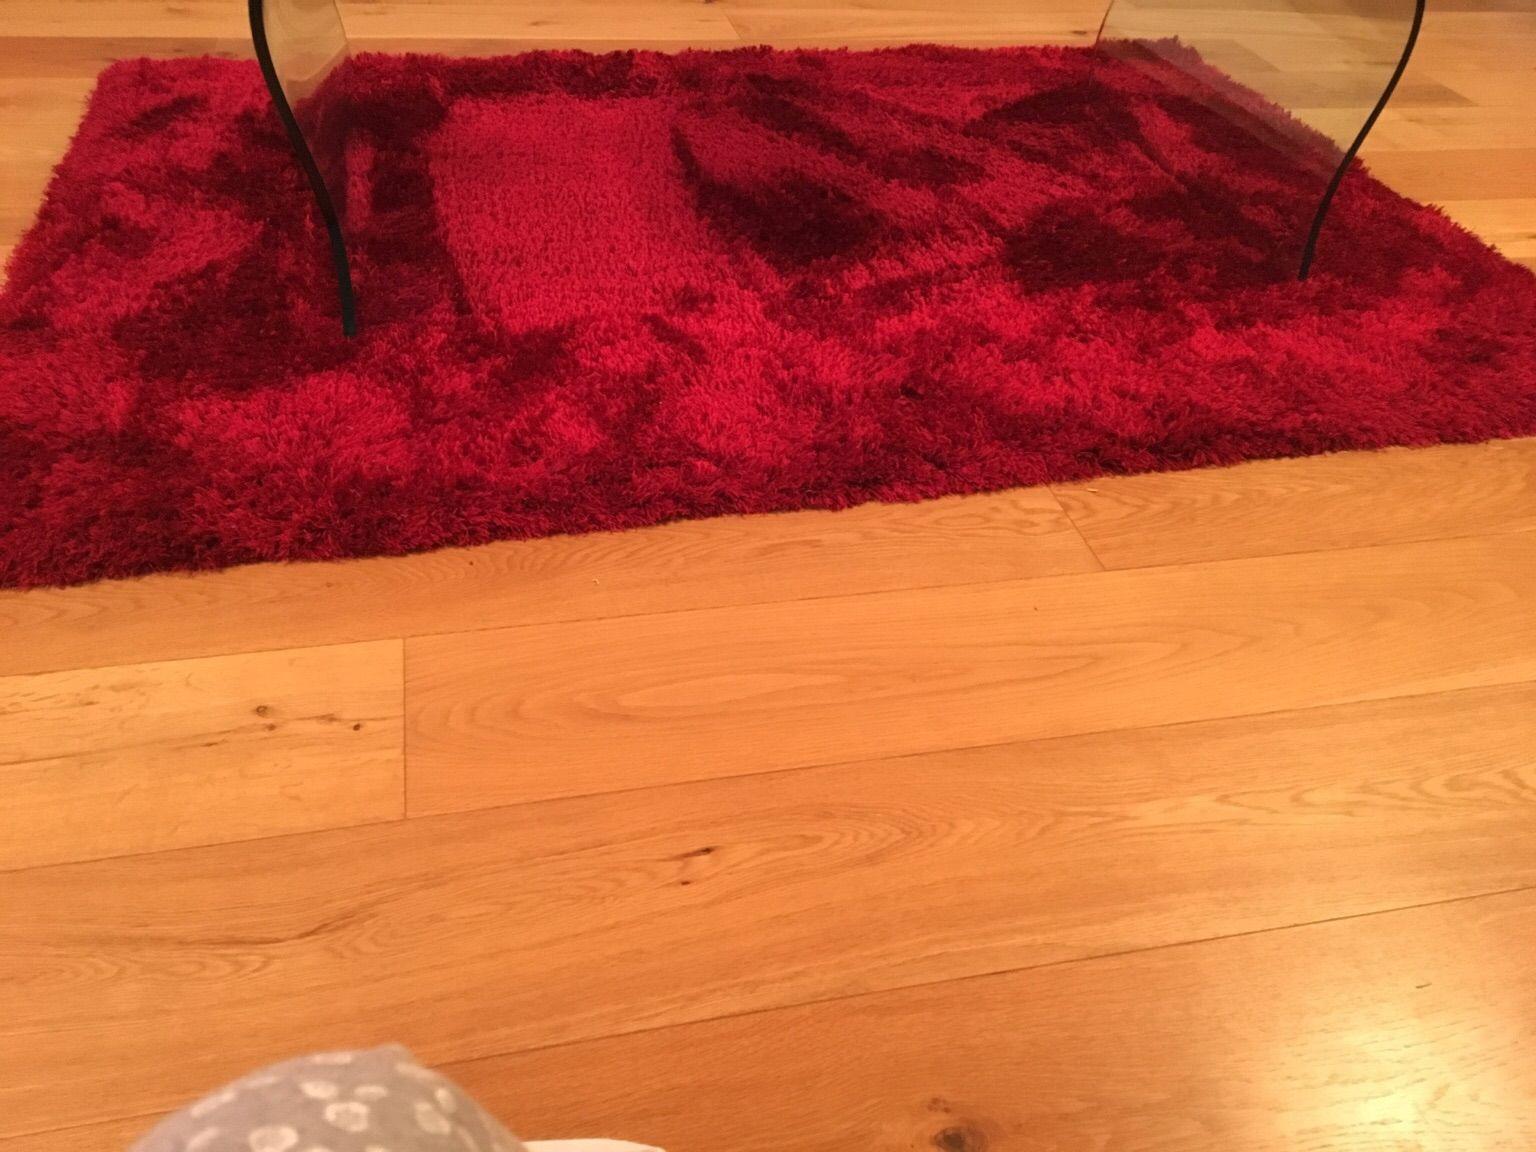 hardwood floor refinishing falmouth ma of https en shpock com i whbc4gvkyvqlr11o 2017 12 22t150254 in john lewis rug 24abbc5c